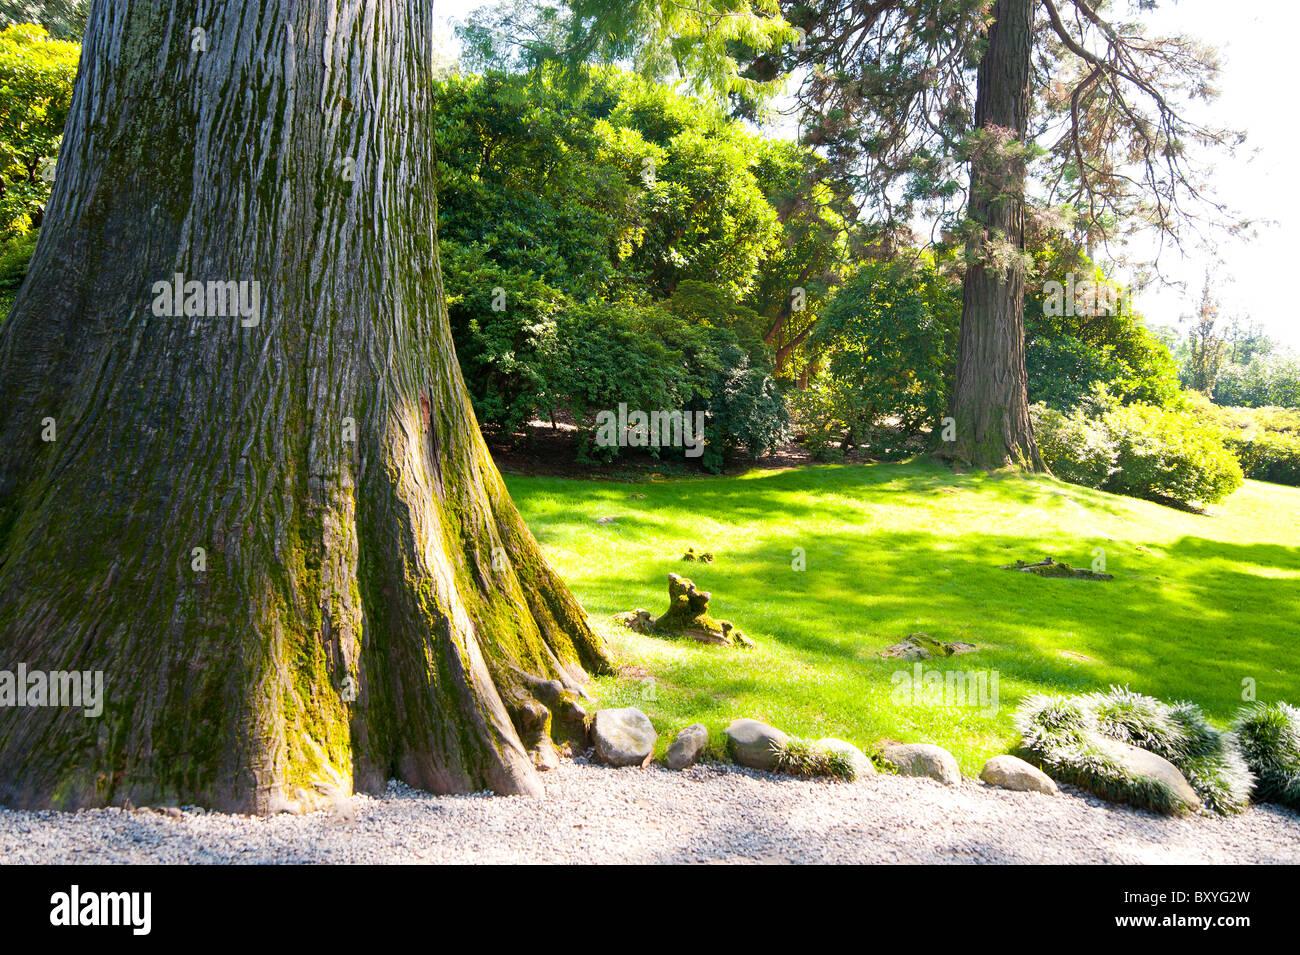 Taxodium Distichum taxodiaceae tree - Stock Image